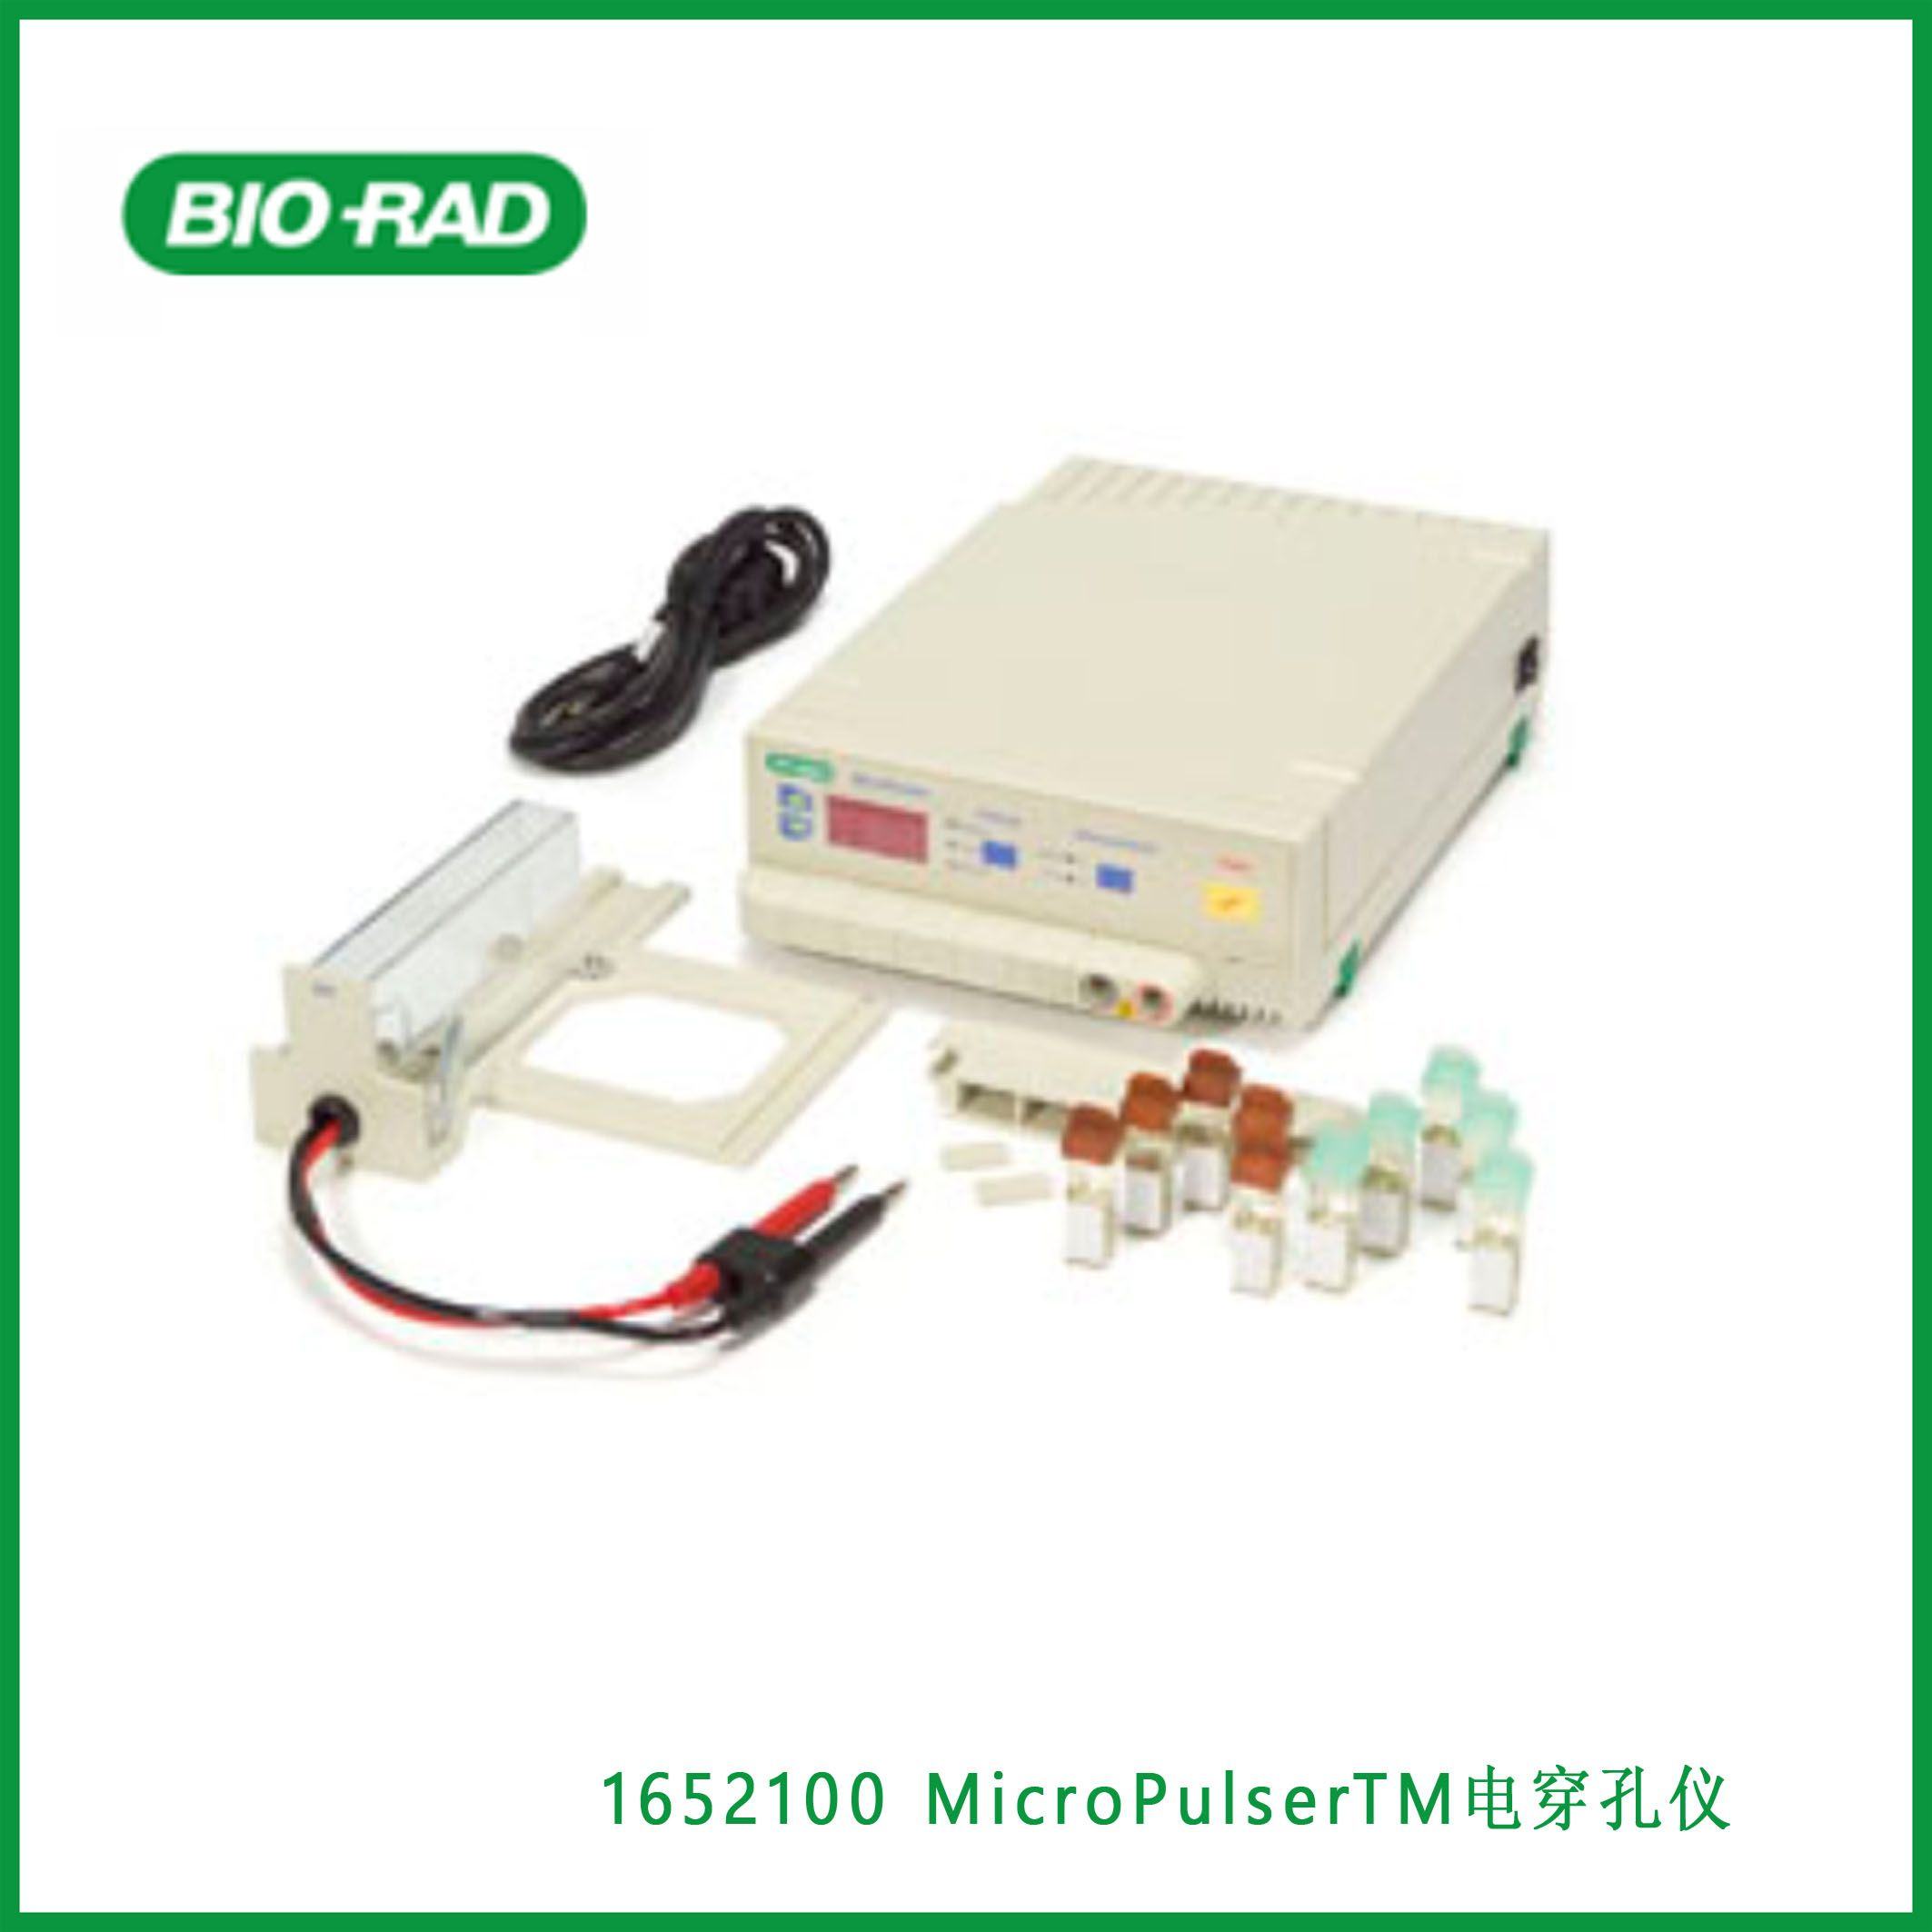 伯乐Bio-Rad1652100 MicroPulser Electroporator,MicroPulserTM电穿孔仪,现货